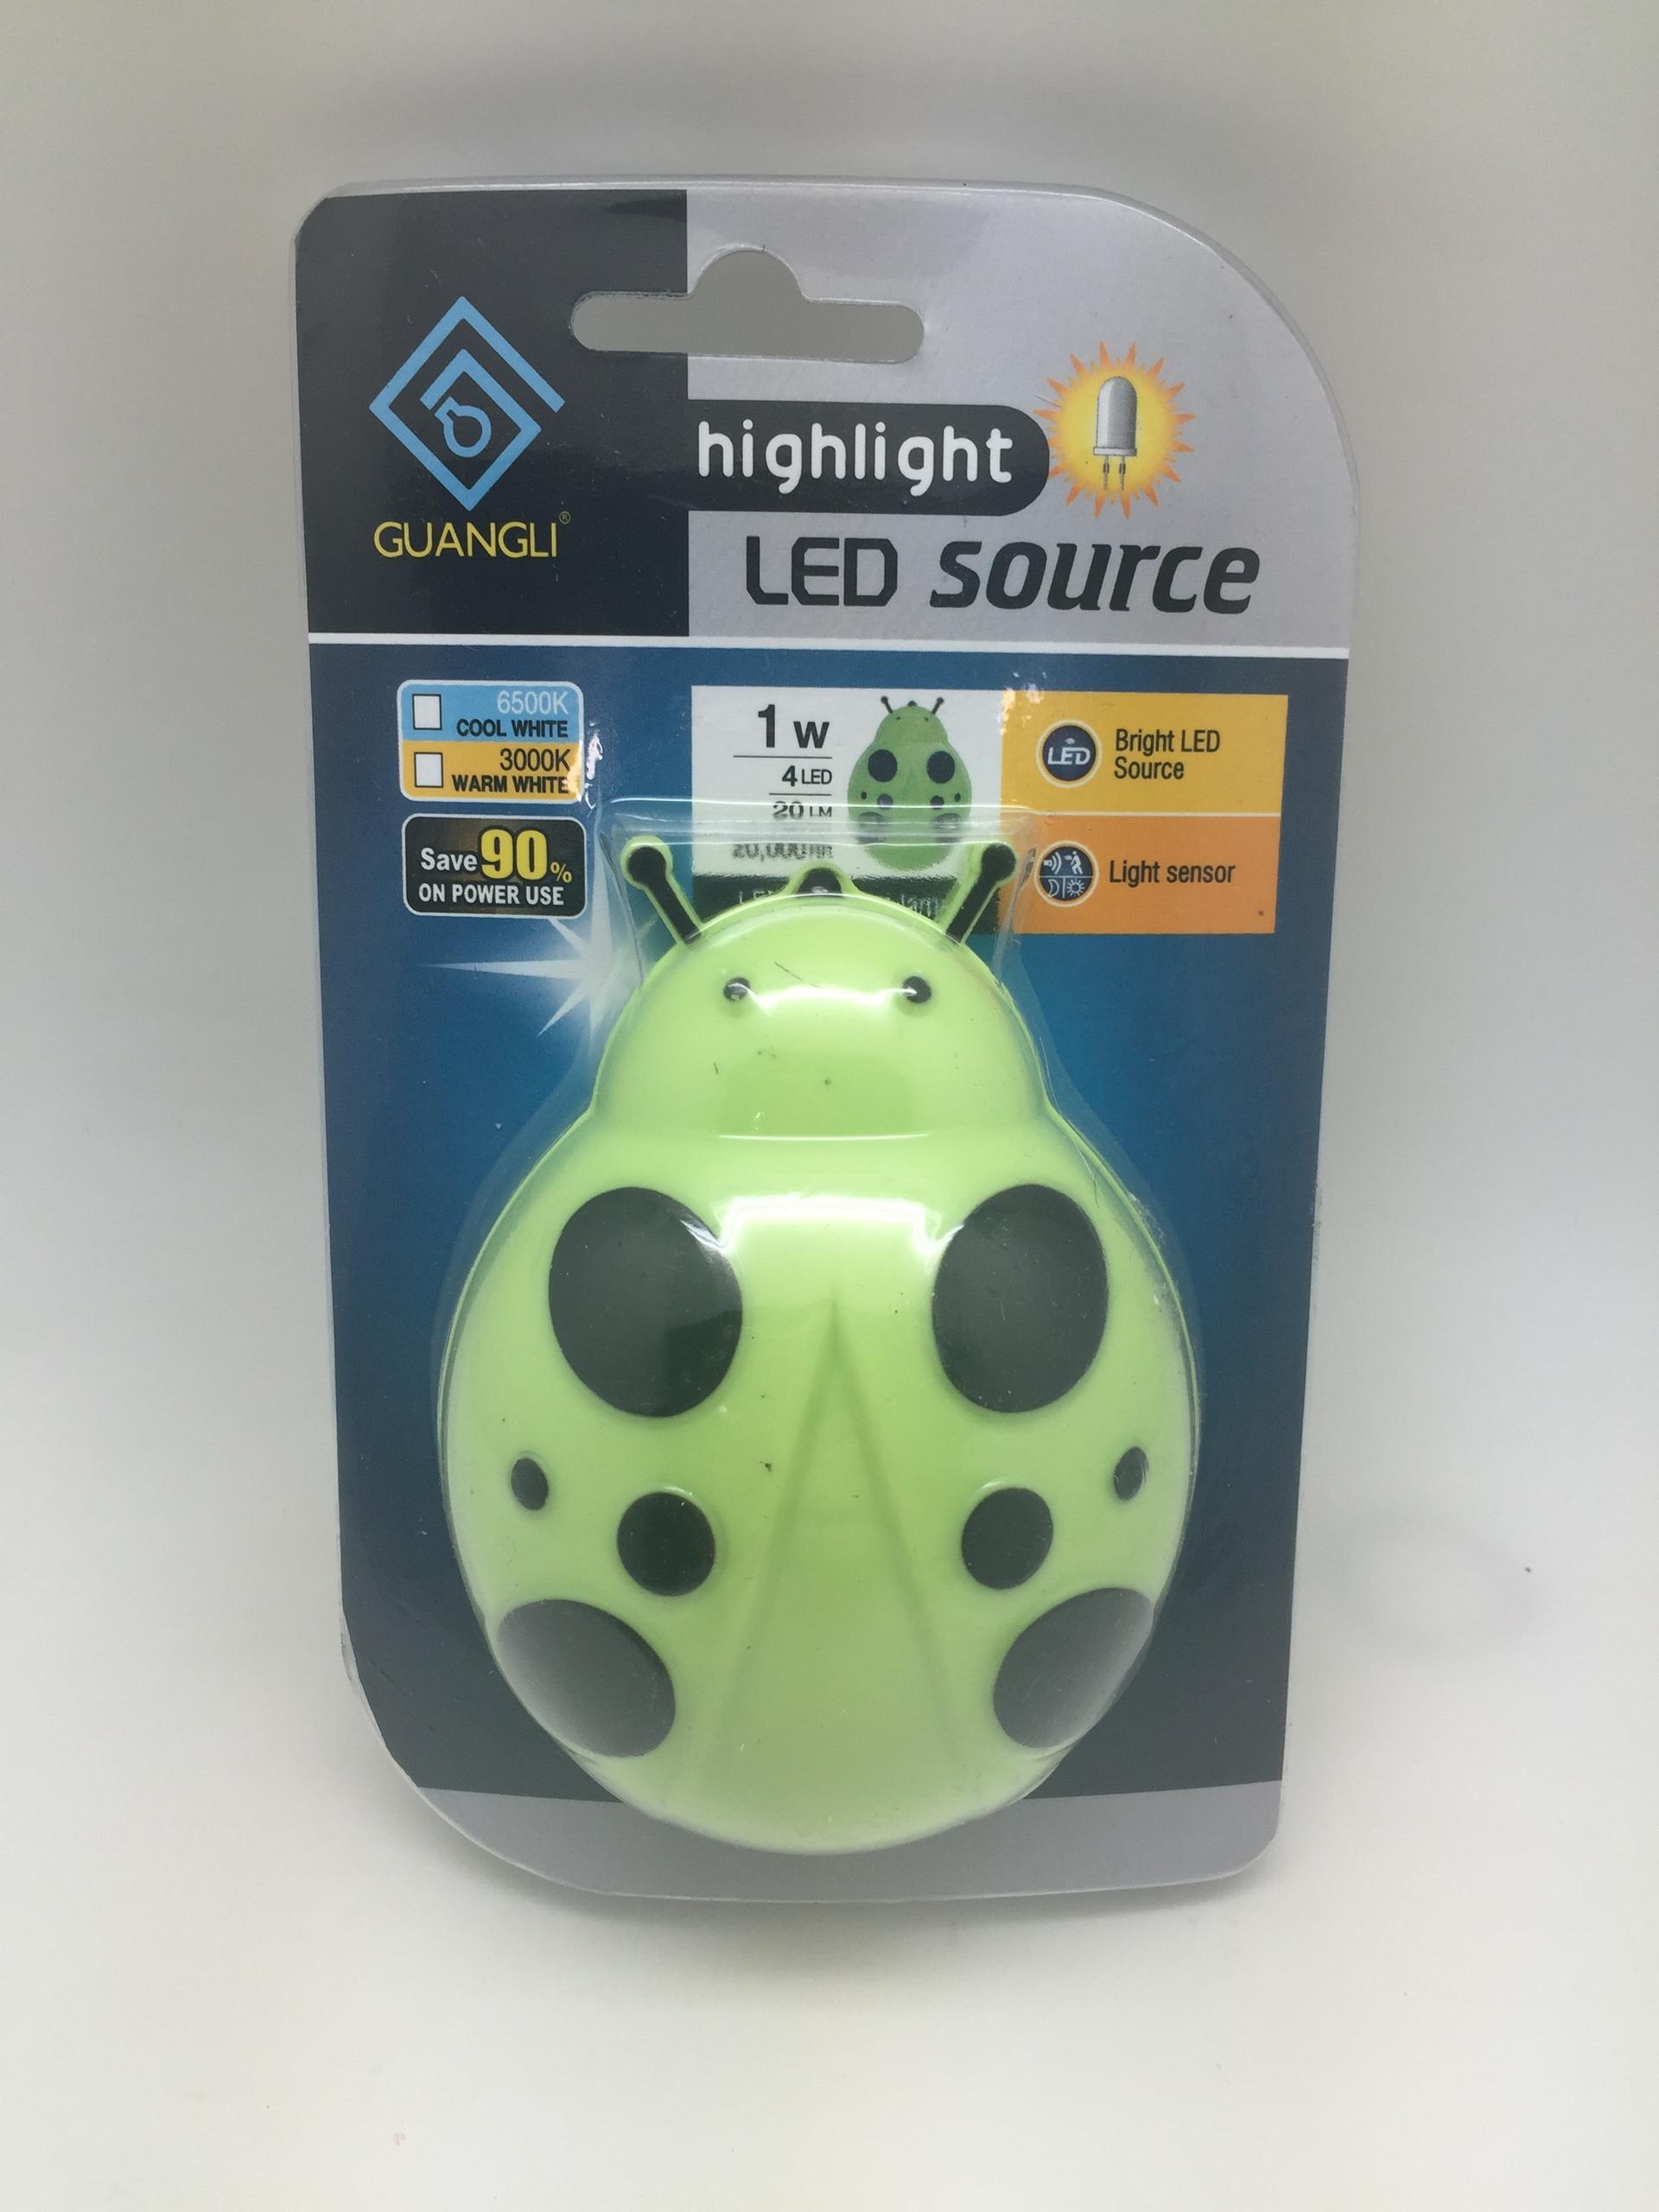 A62 OEMBeetle sensor animal shape plug in night light lamp for bedside baby kids